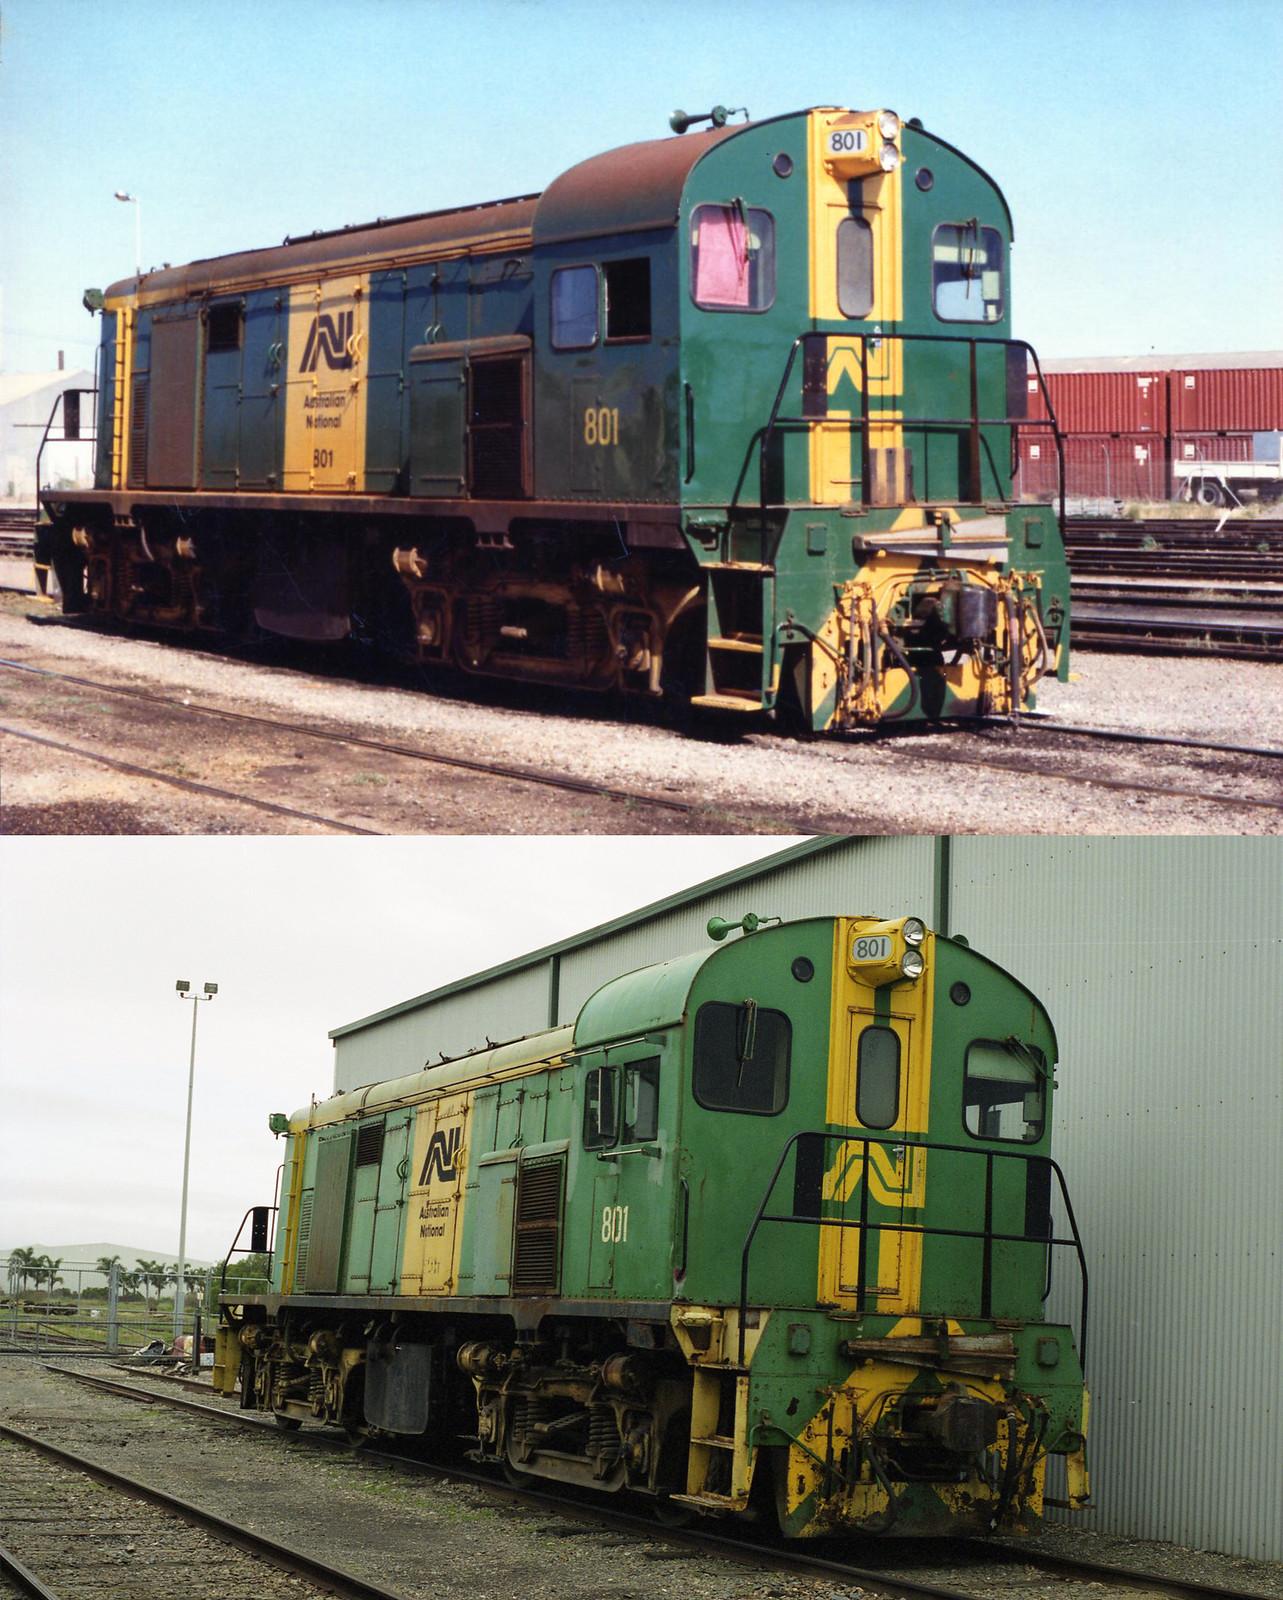 Loco 801 - Age Comparison by Ryan Smith